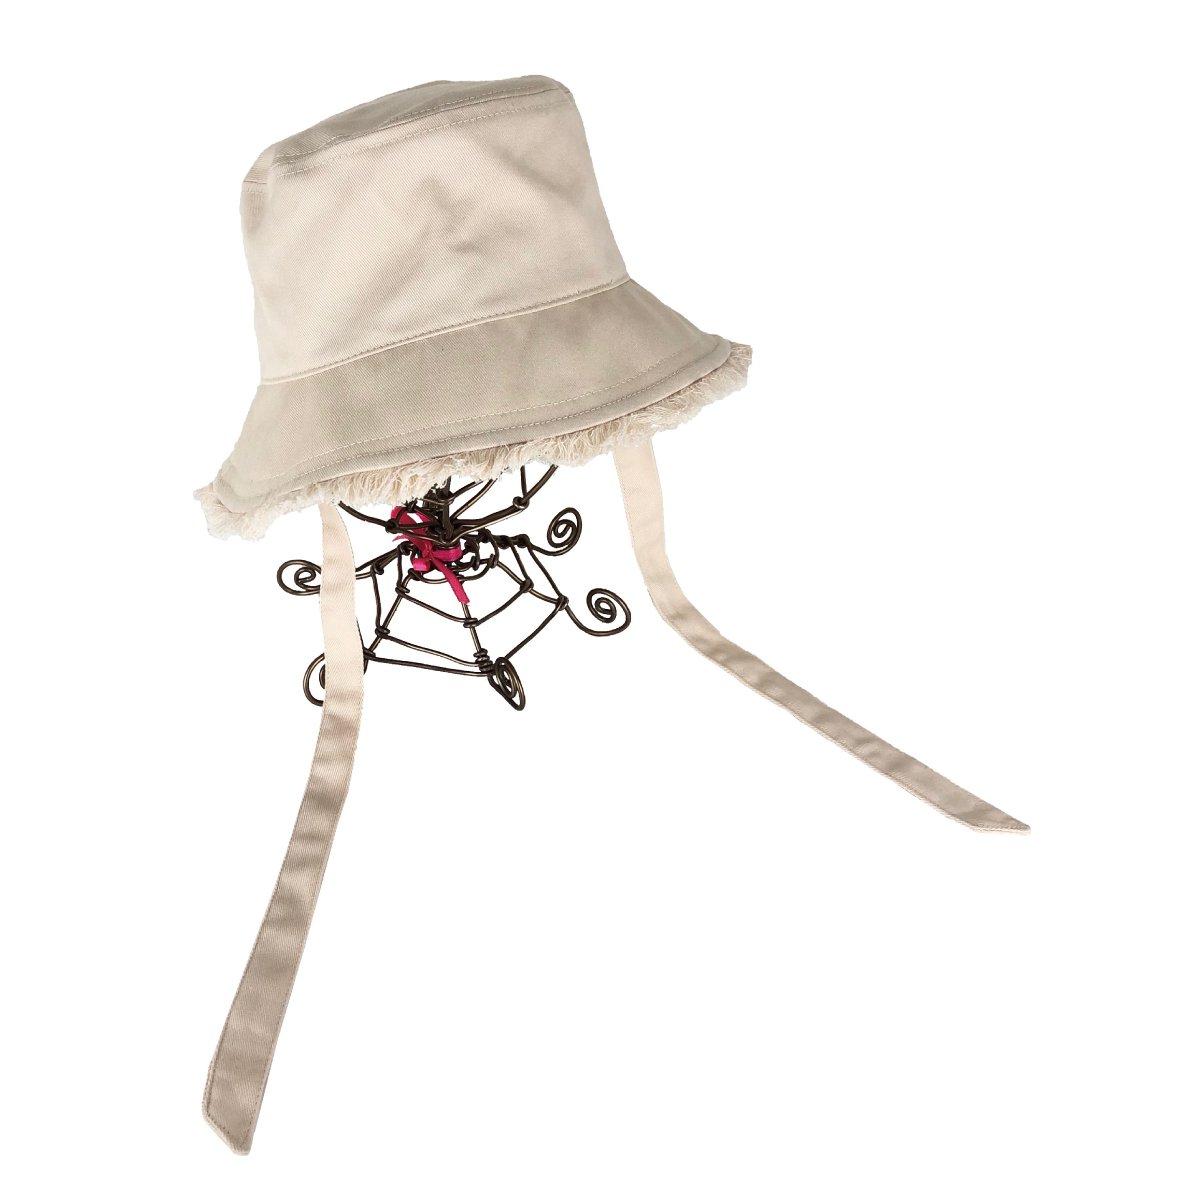 【BABY】Baby Fringe Hat 詳細画像5